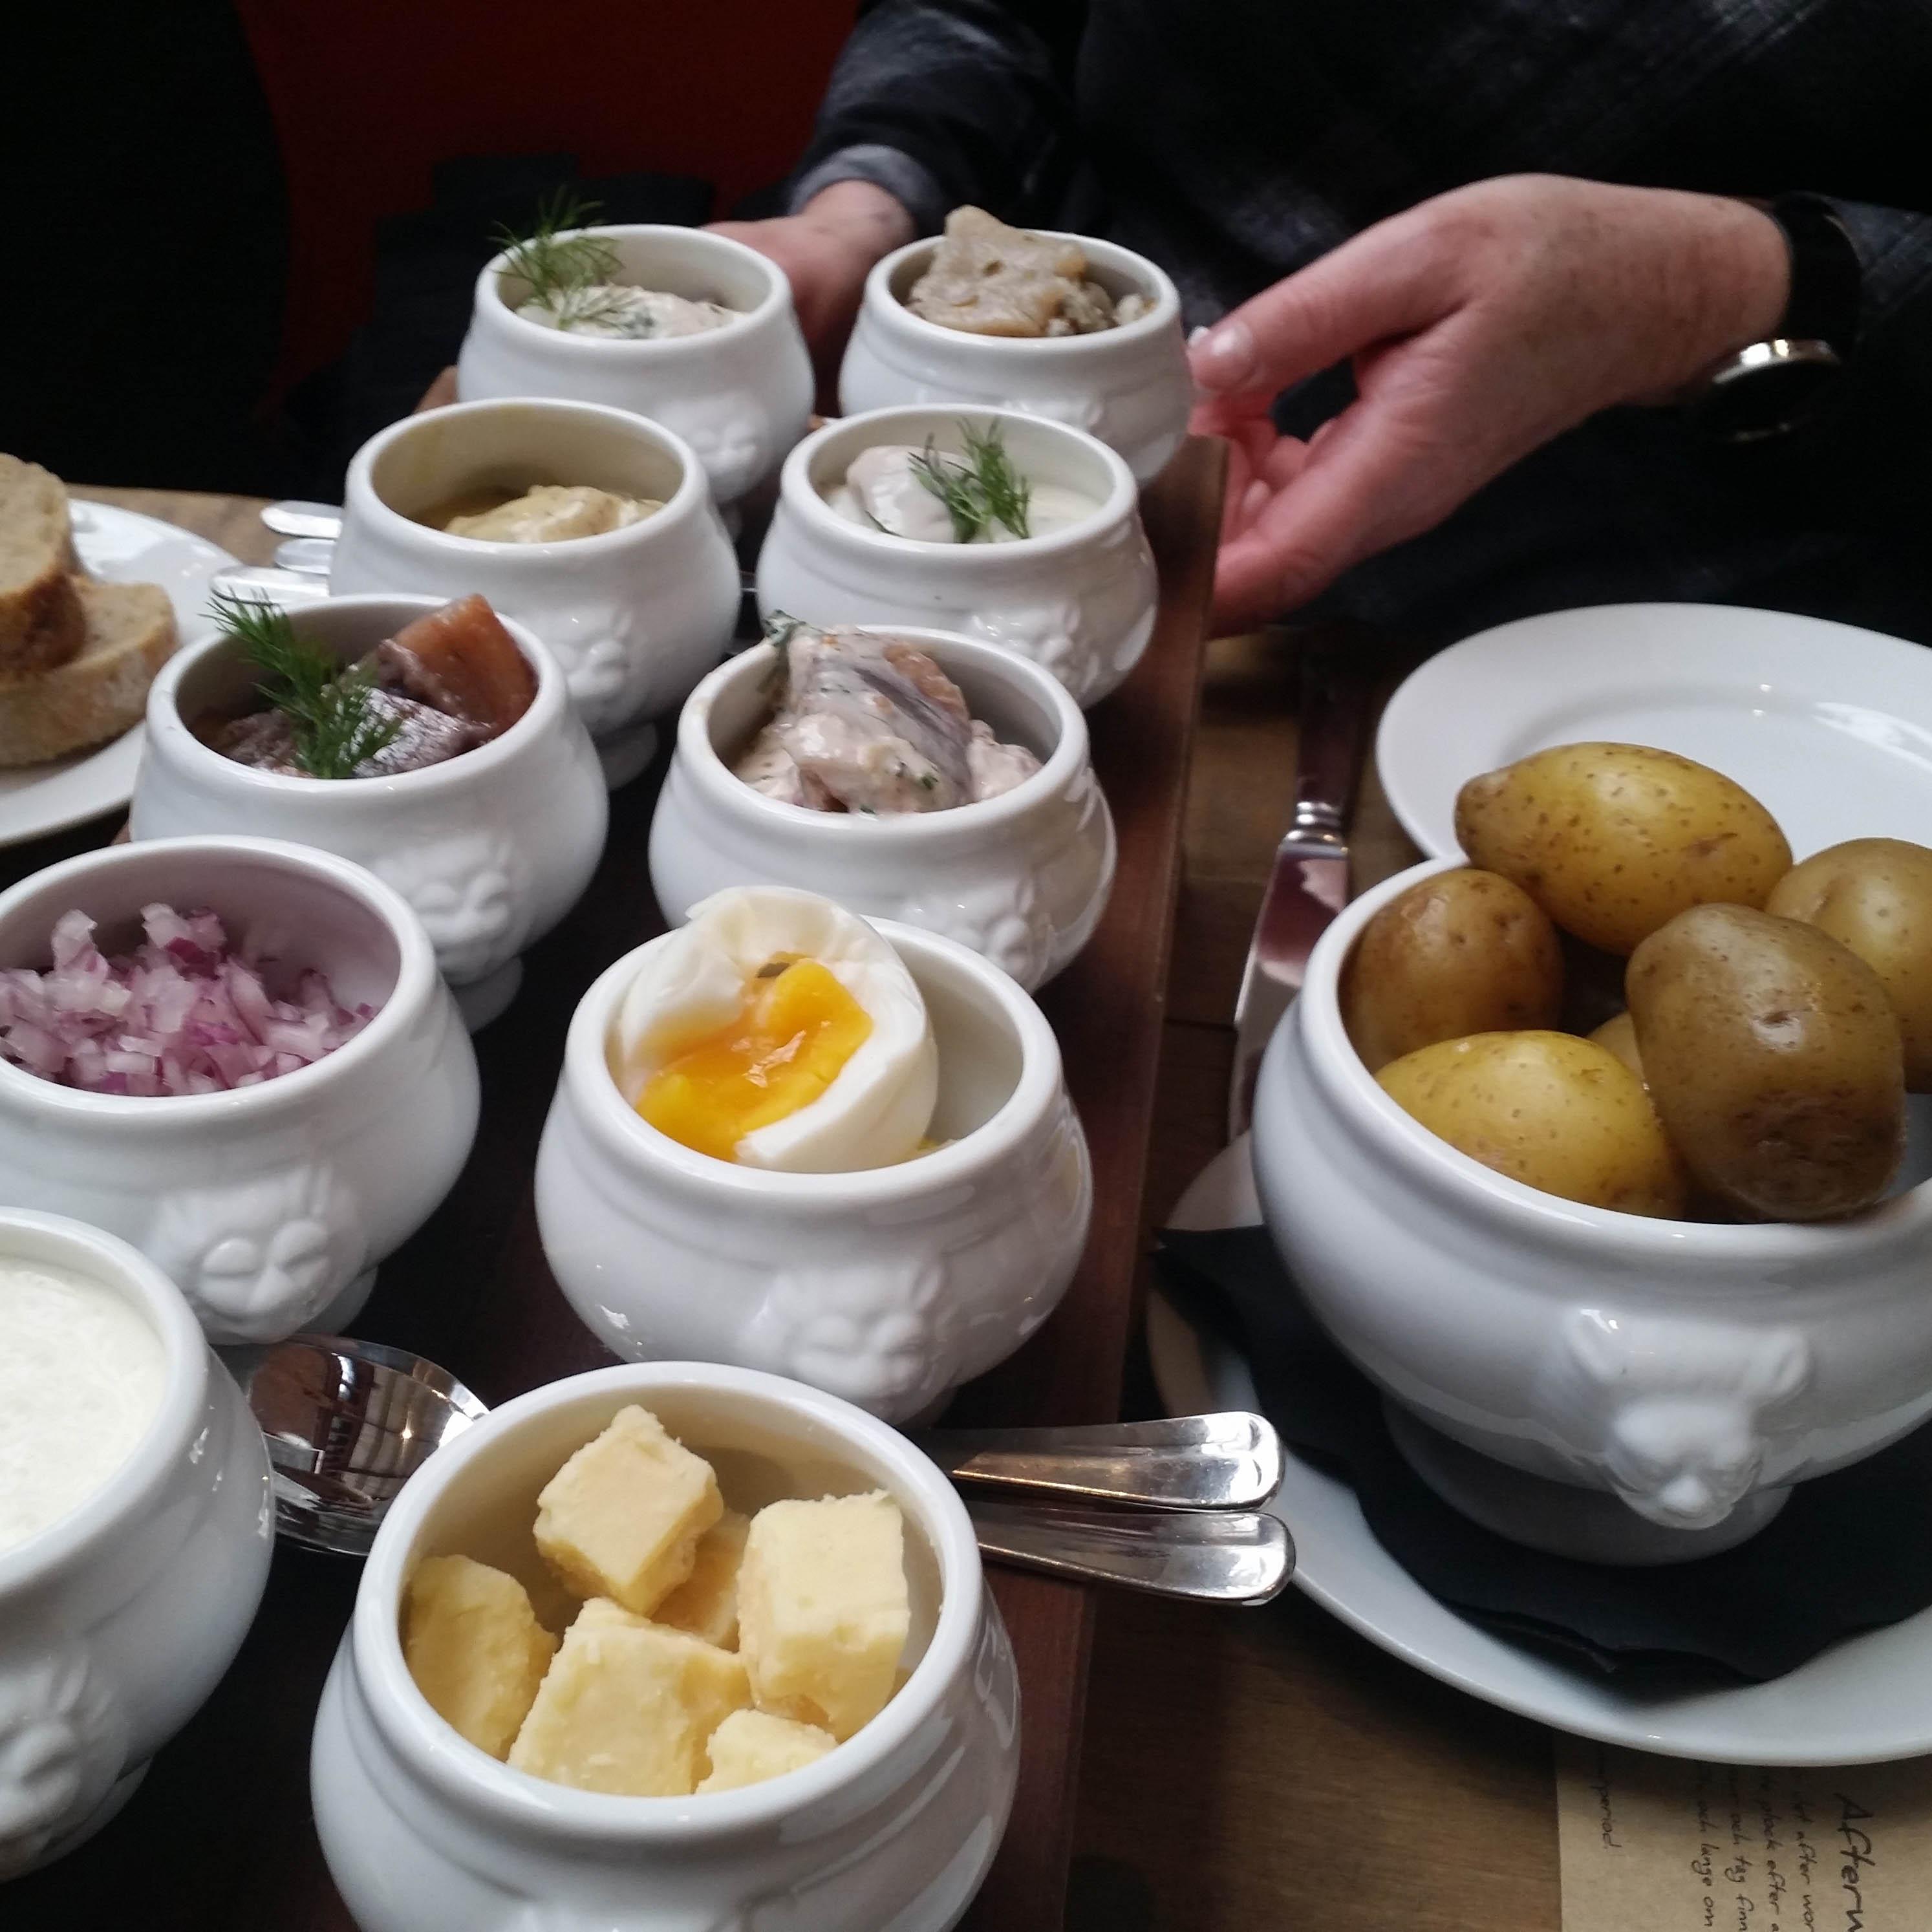 Swedish Food in Swedish Copenhagen